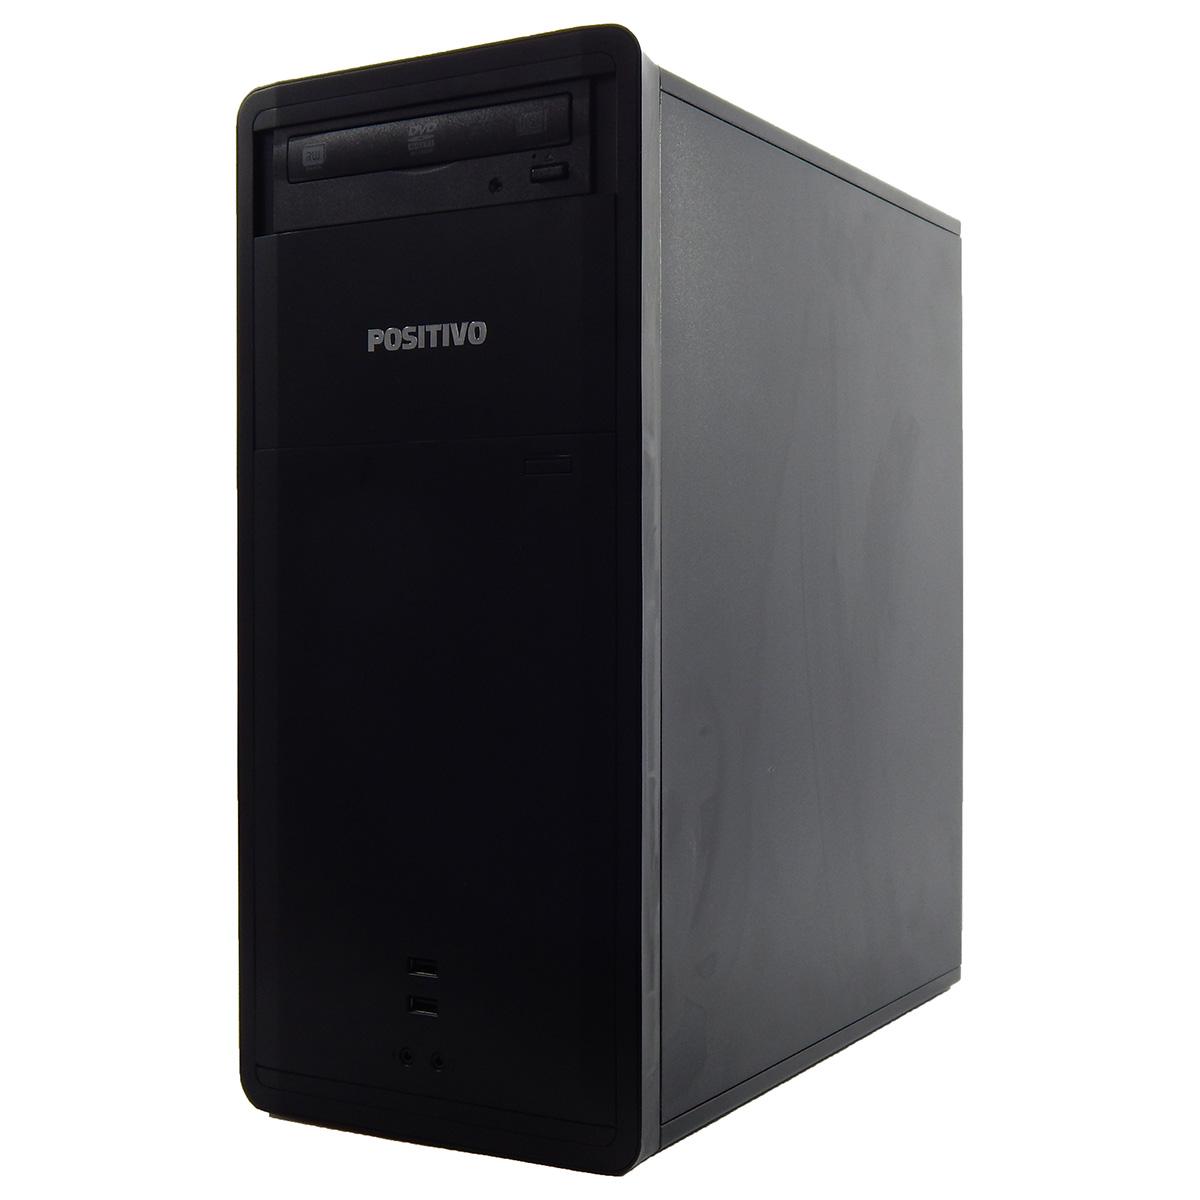 PC POSITIVO PREMIUM DRI8432 I3-2120 4Gb 320Gb Gravador DVD - Reembalado